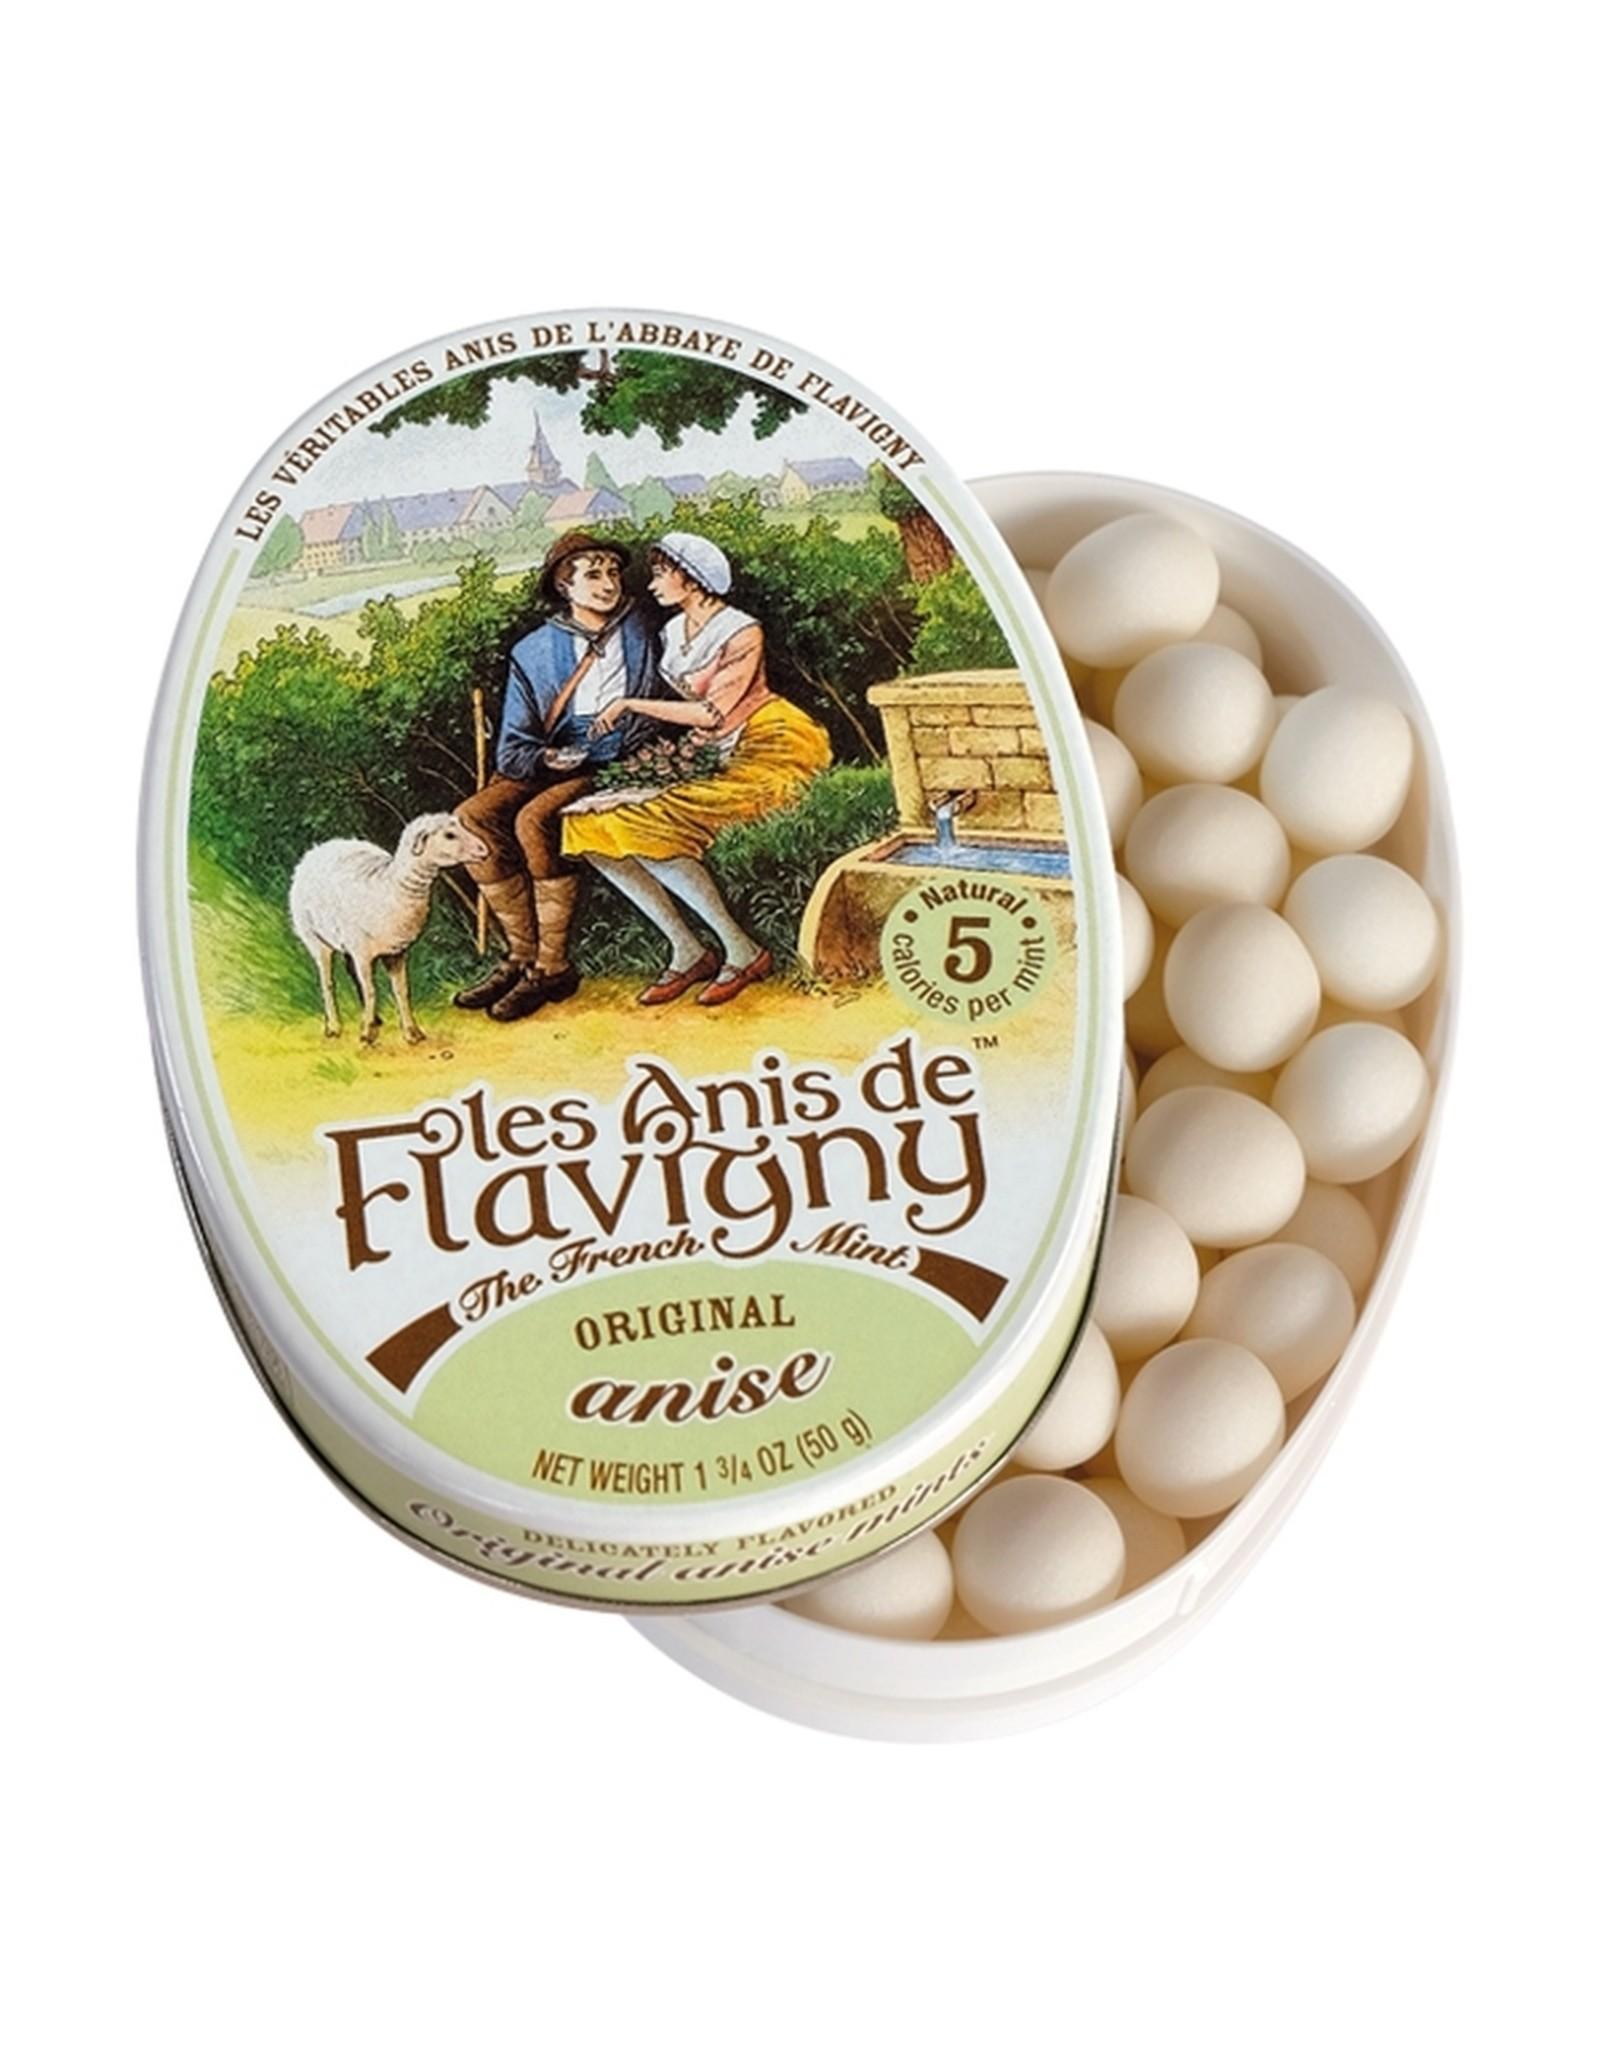 Les Anis Flavigny Les Anis Flavigny Mint Tin (Anise)